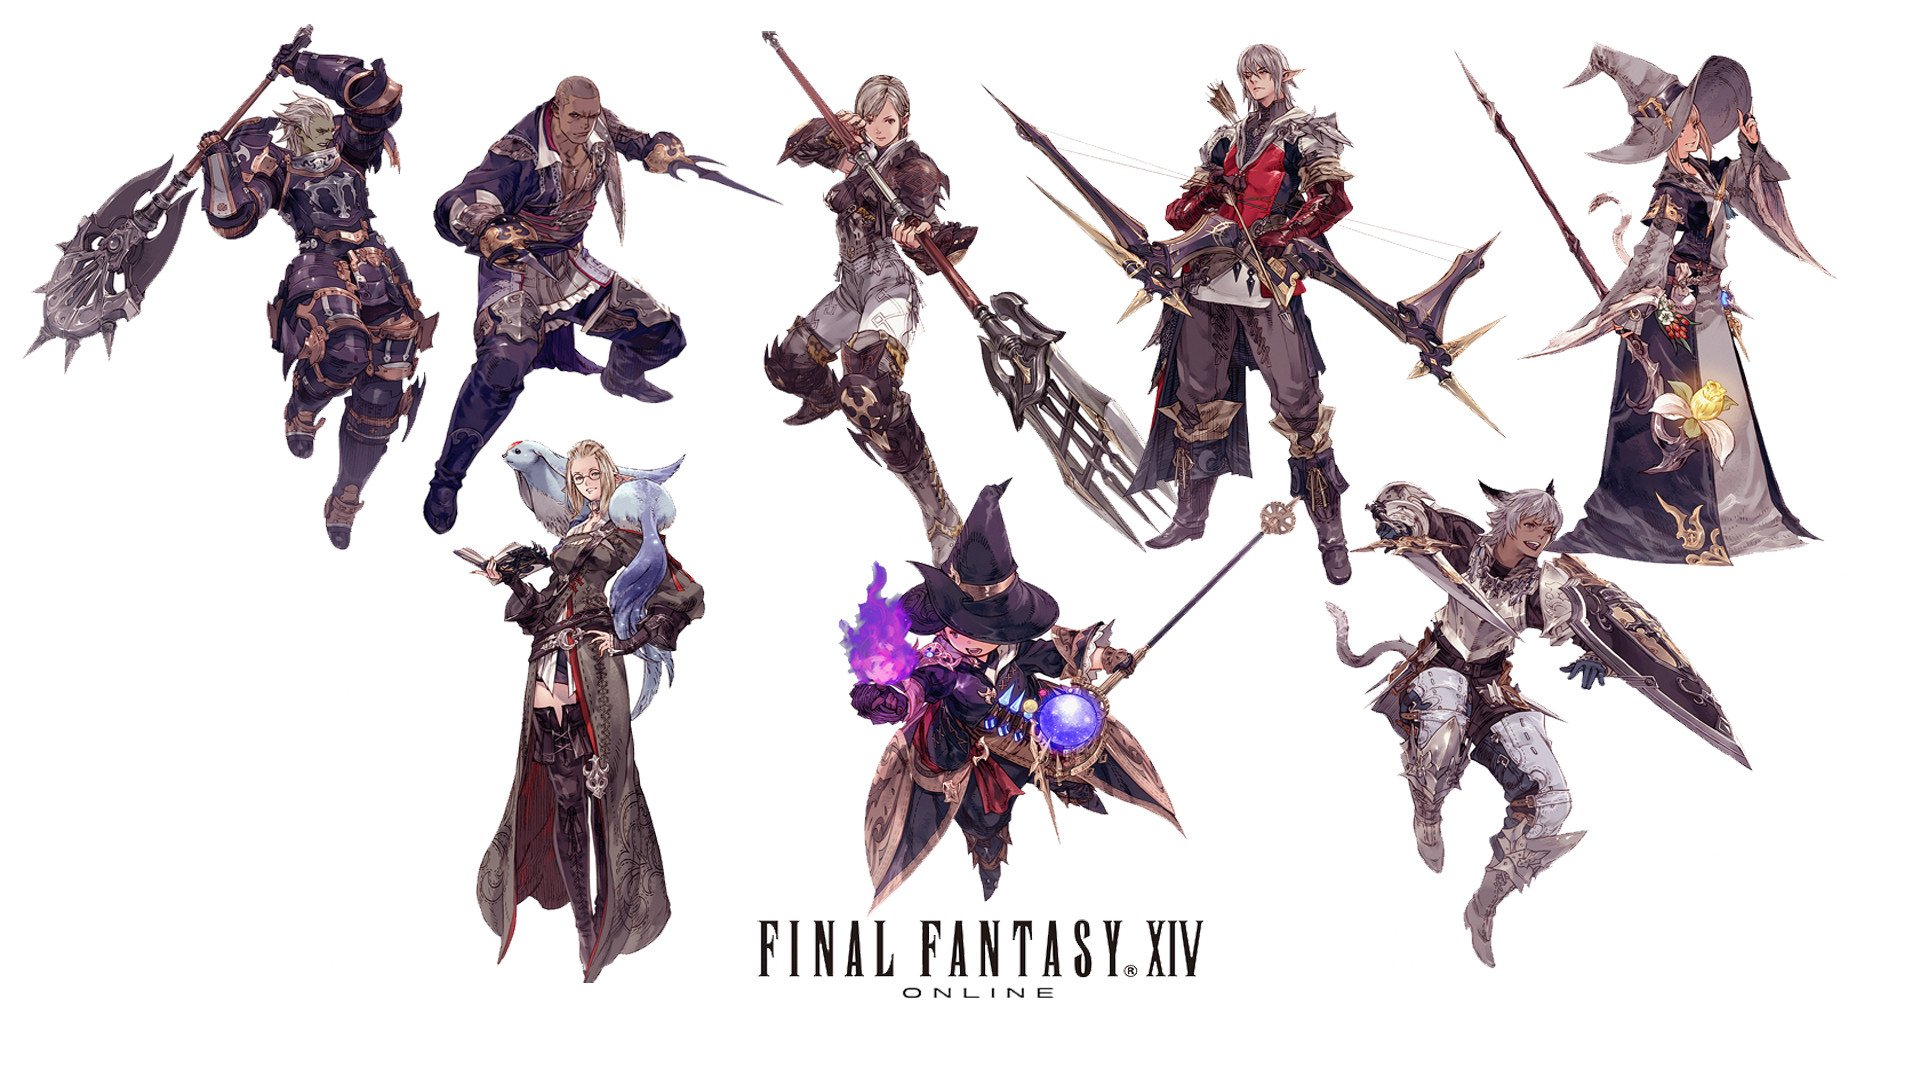 Final Fantasy Xiv A Realm Reborn Fantasy Art Wallpapers: Final Fantasy Realm Reborn Wallpaper